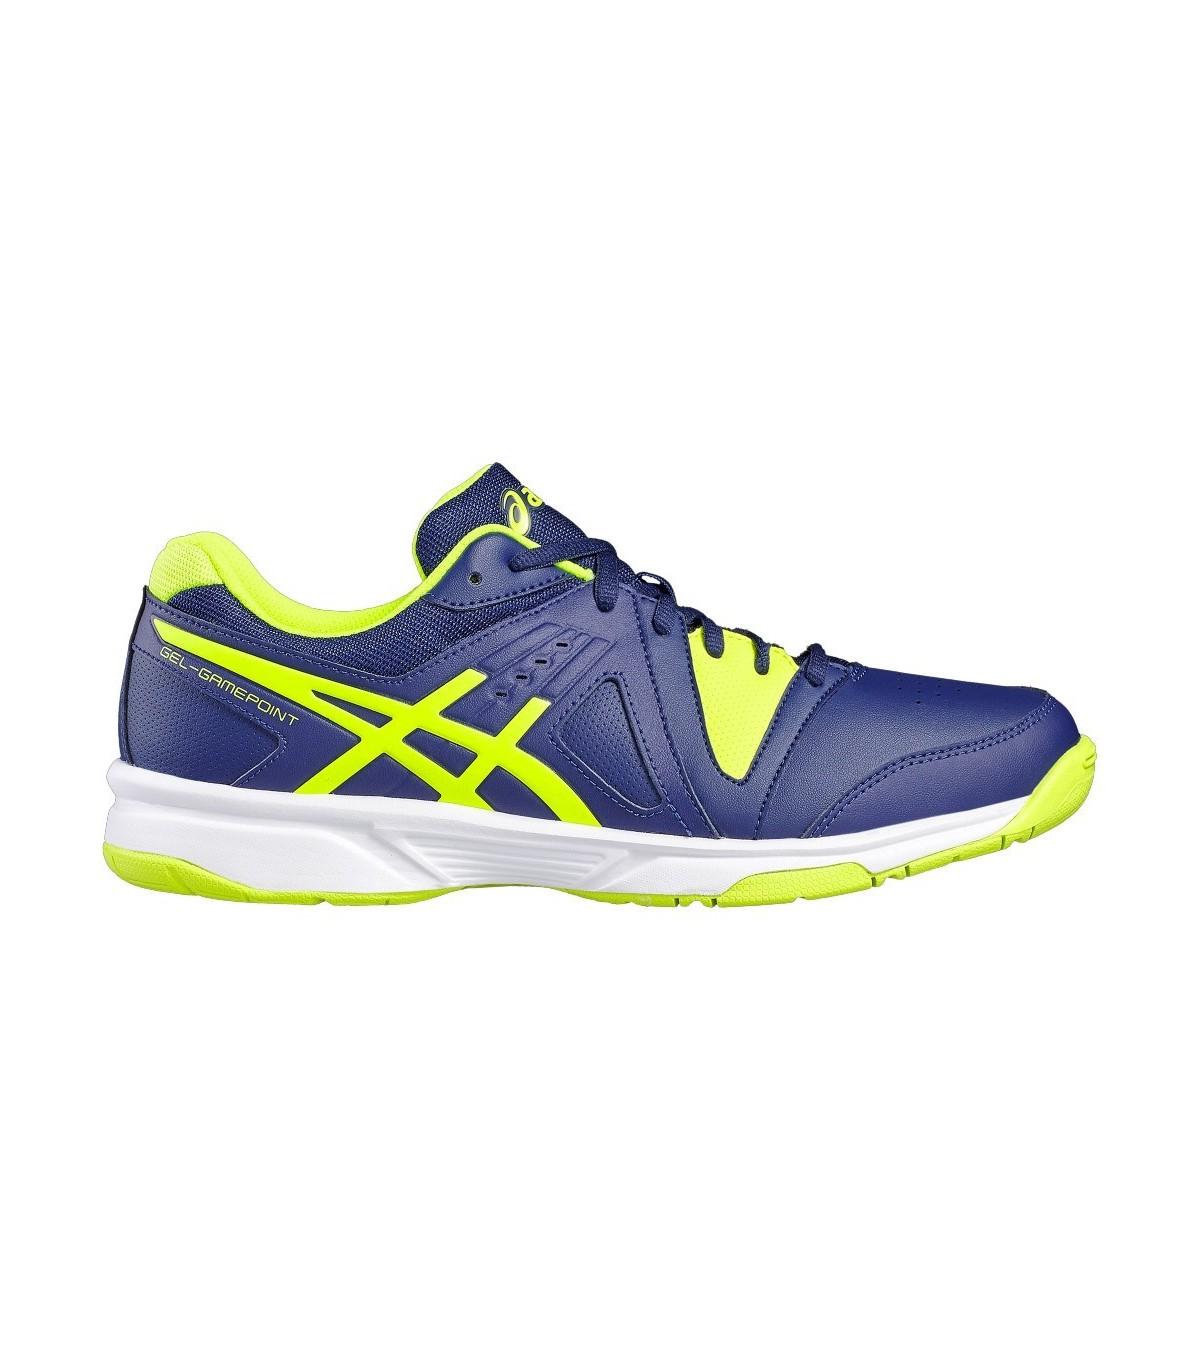 asics chaussure de squash